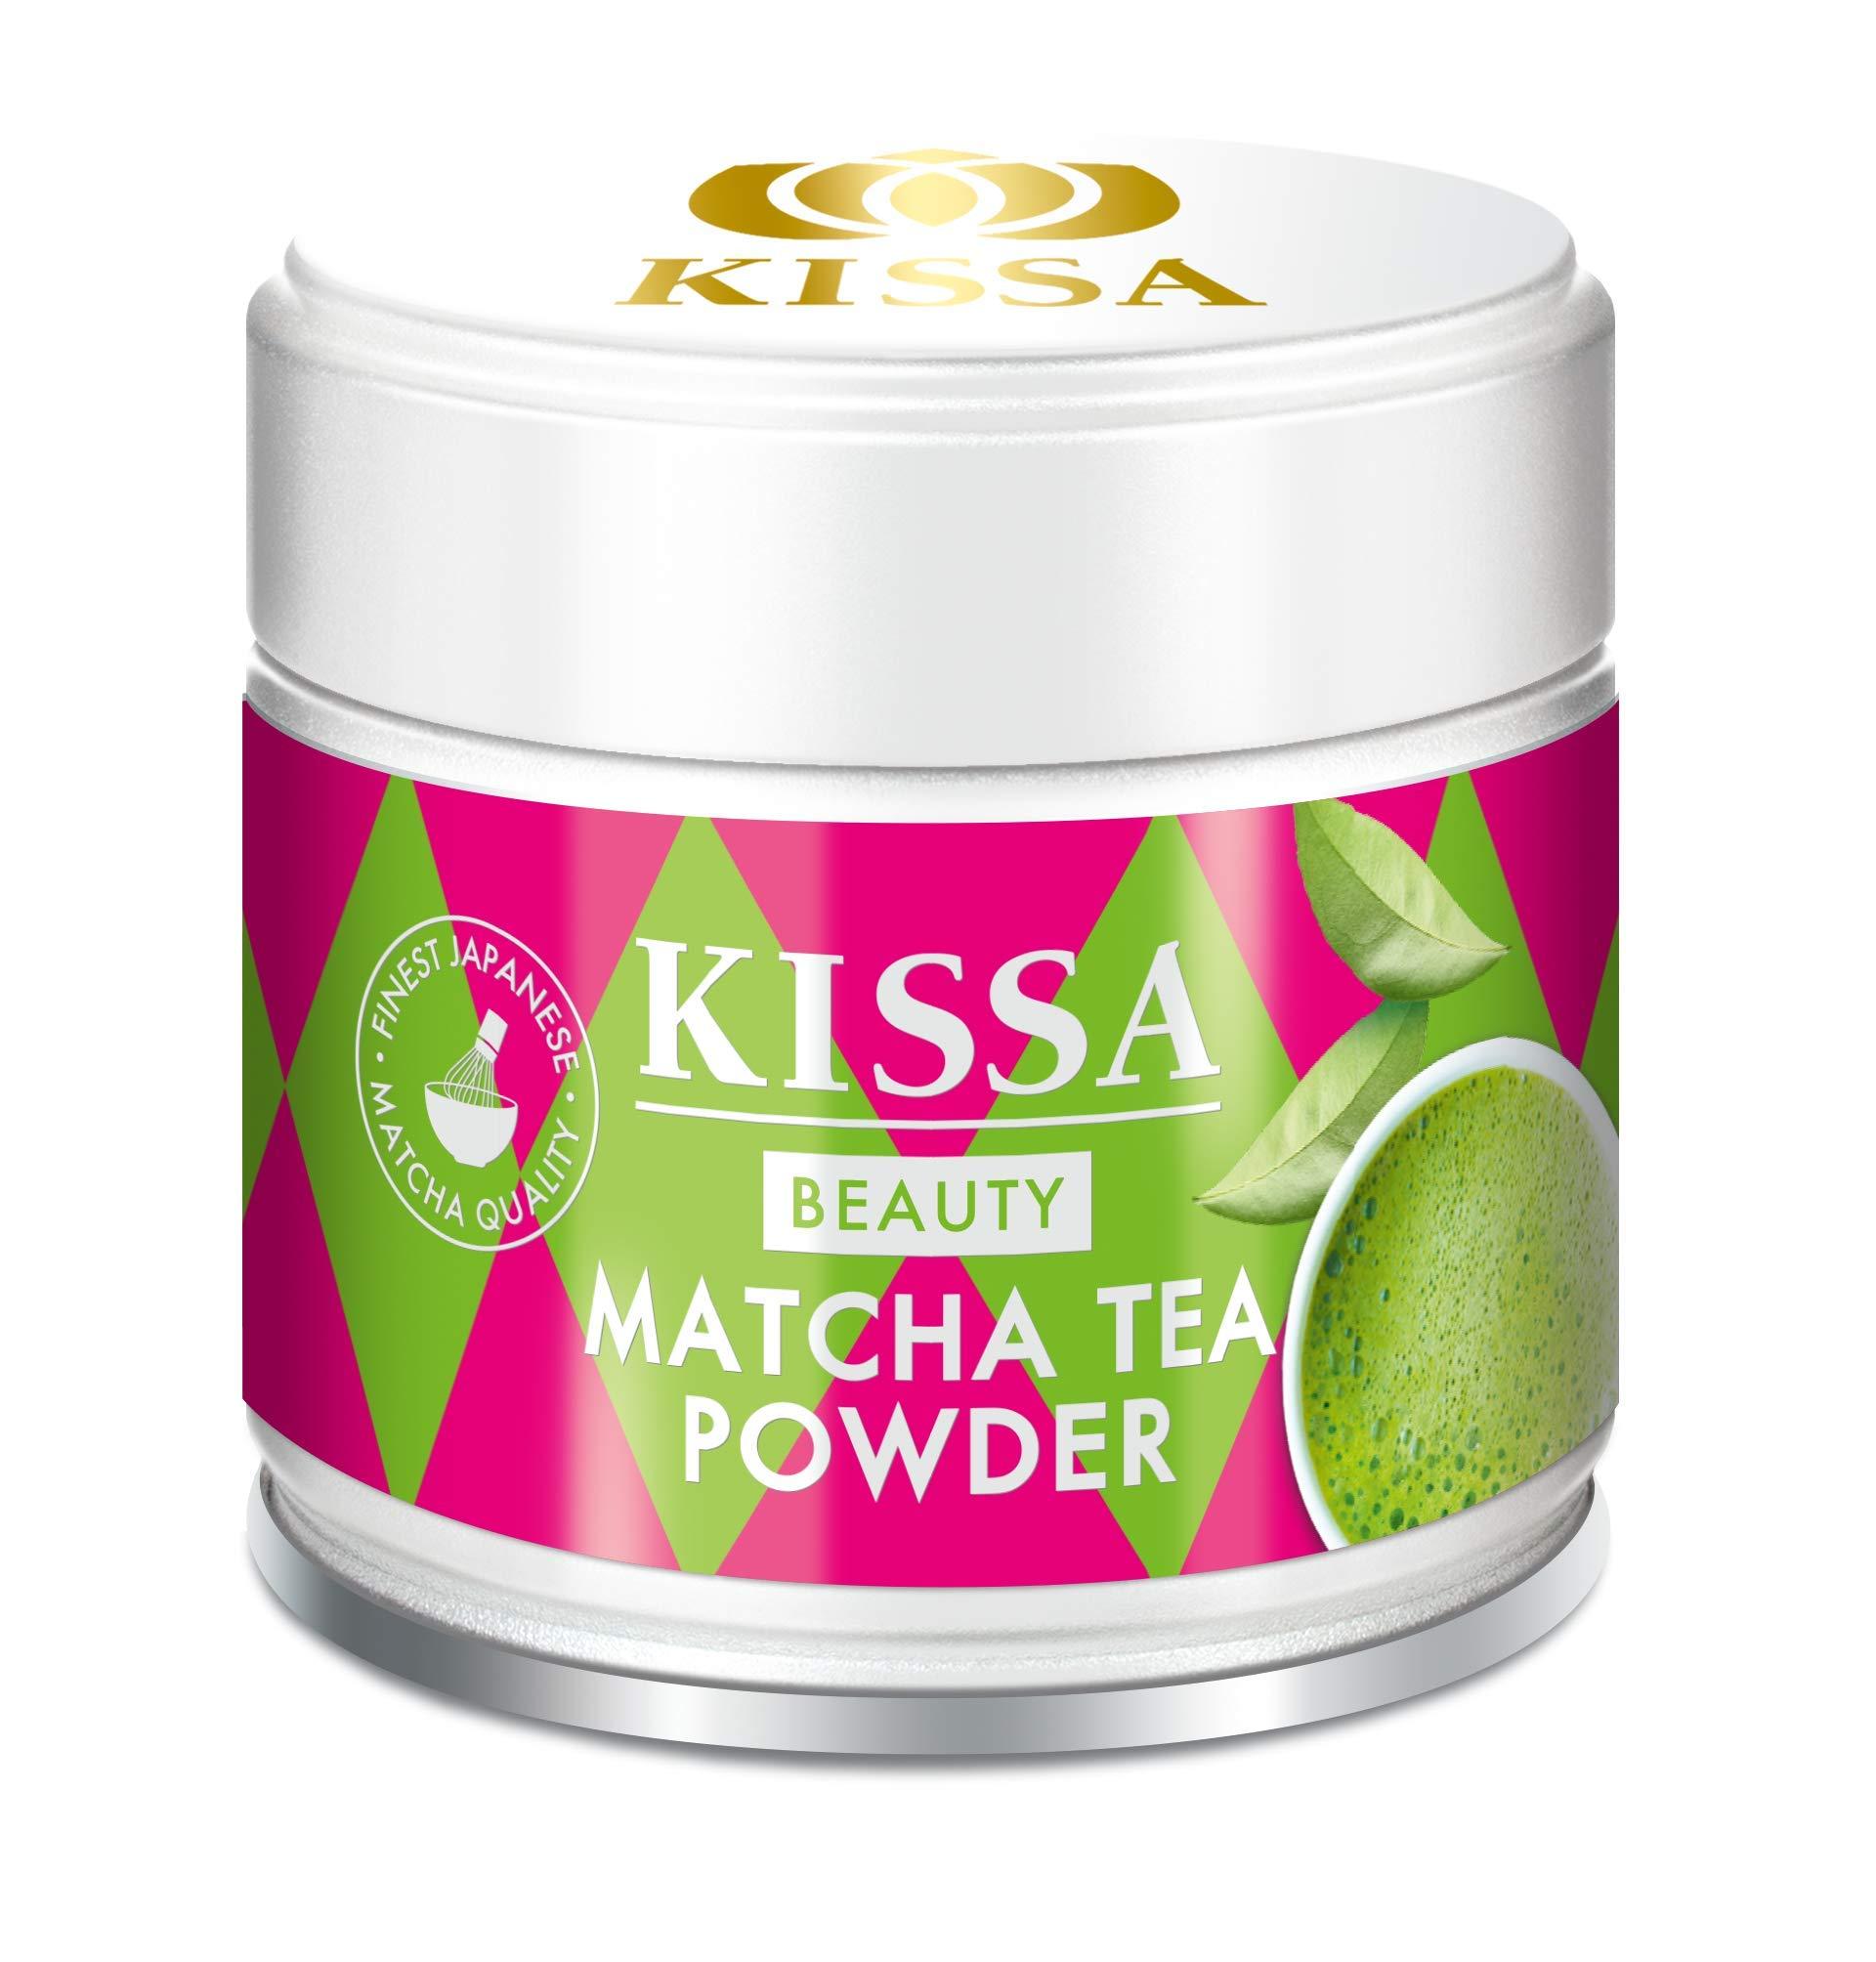 Kissa-Tea-Bio-Matcha-Beauty-30g